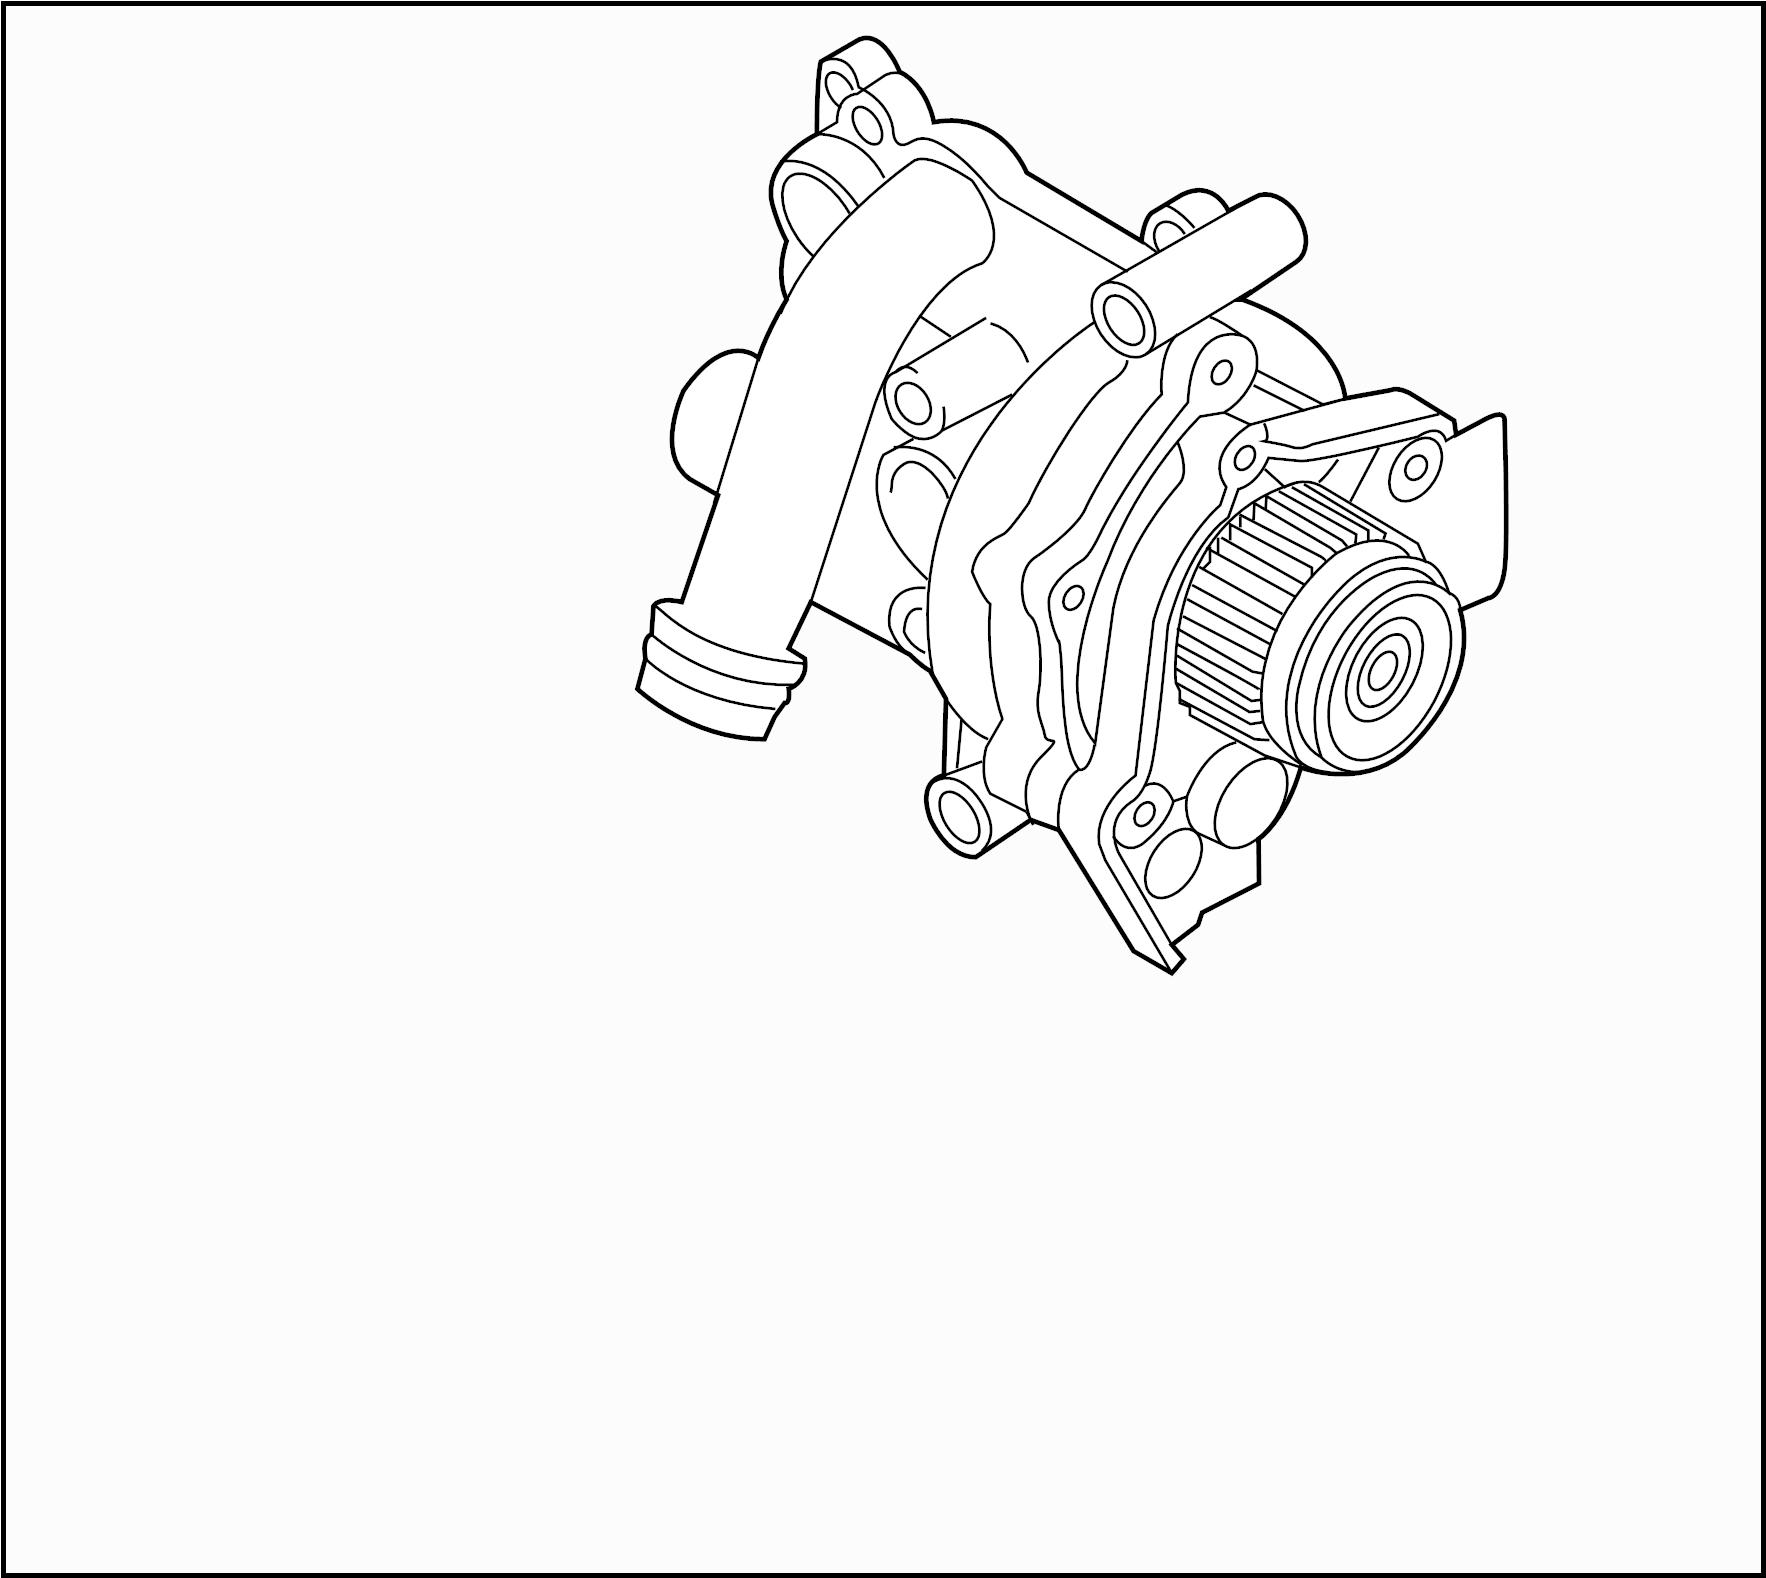 Volkswagen Passat Engine Water Pump Assembly